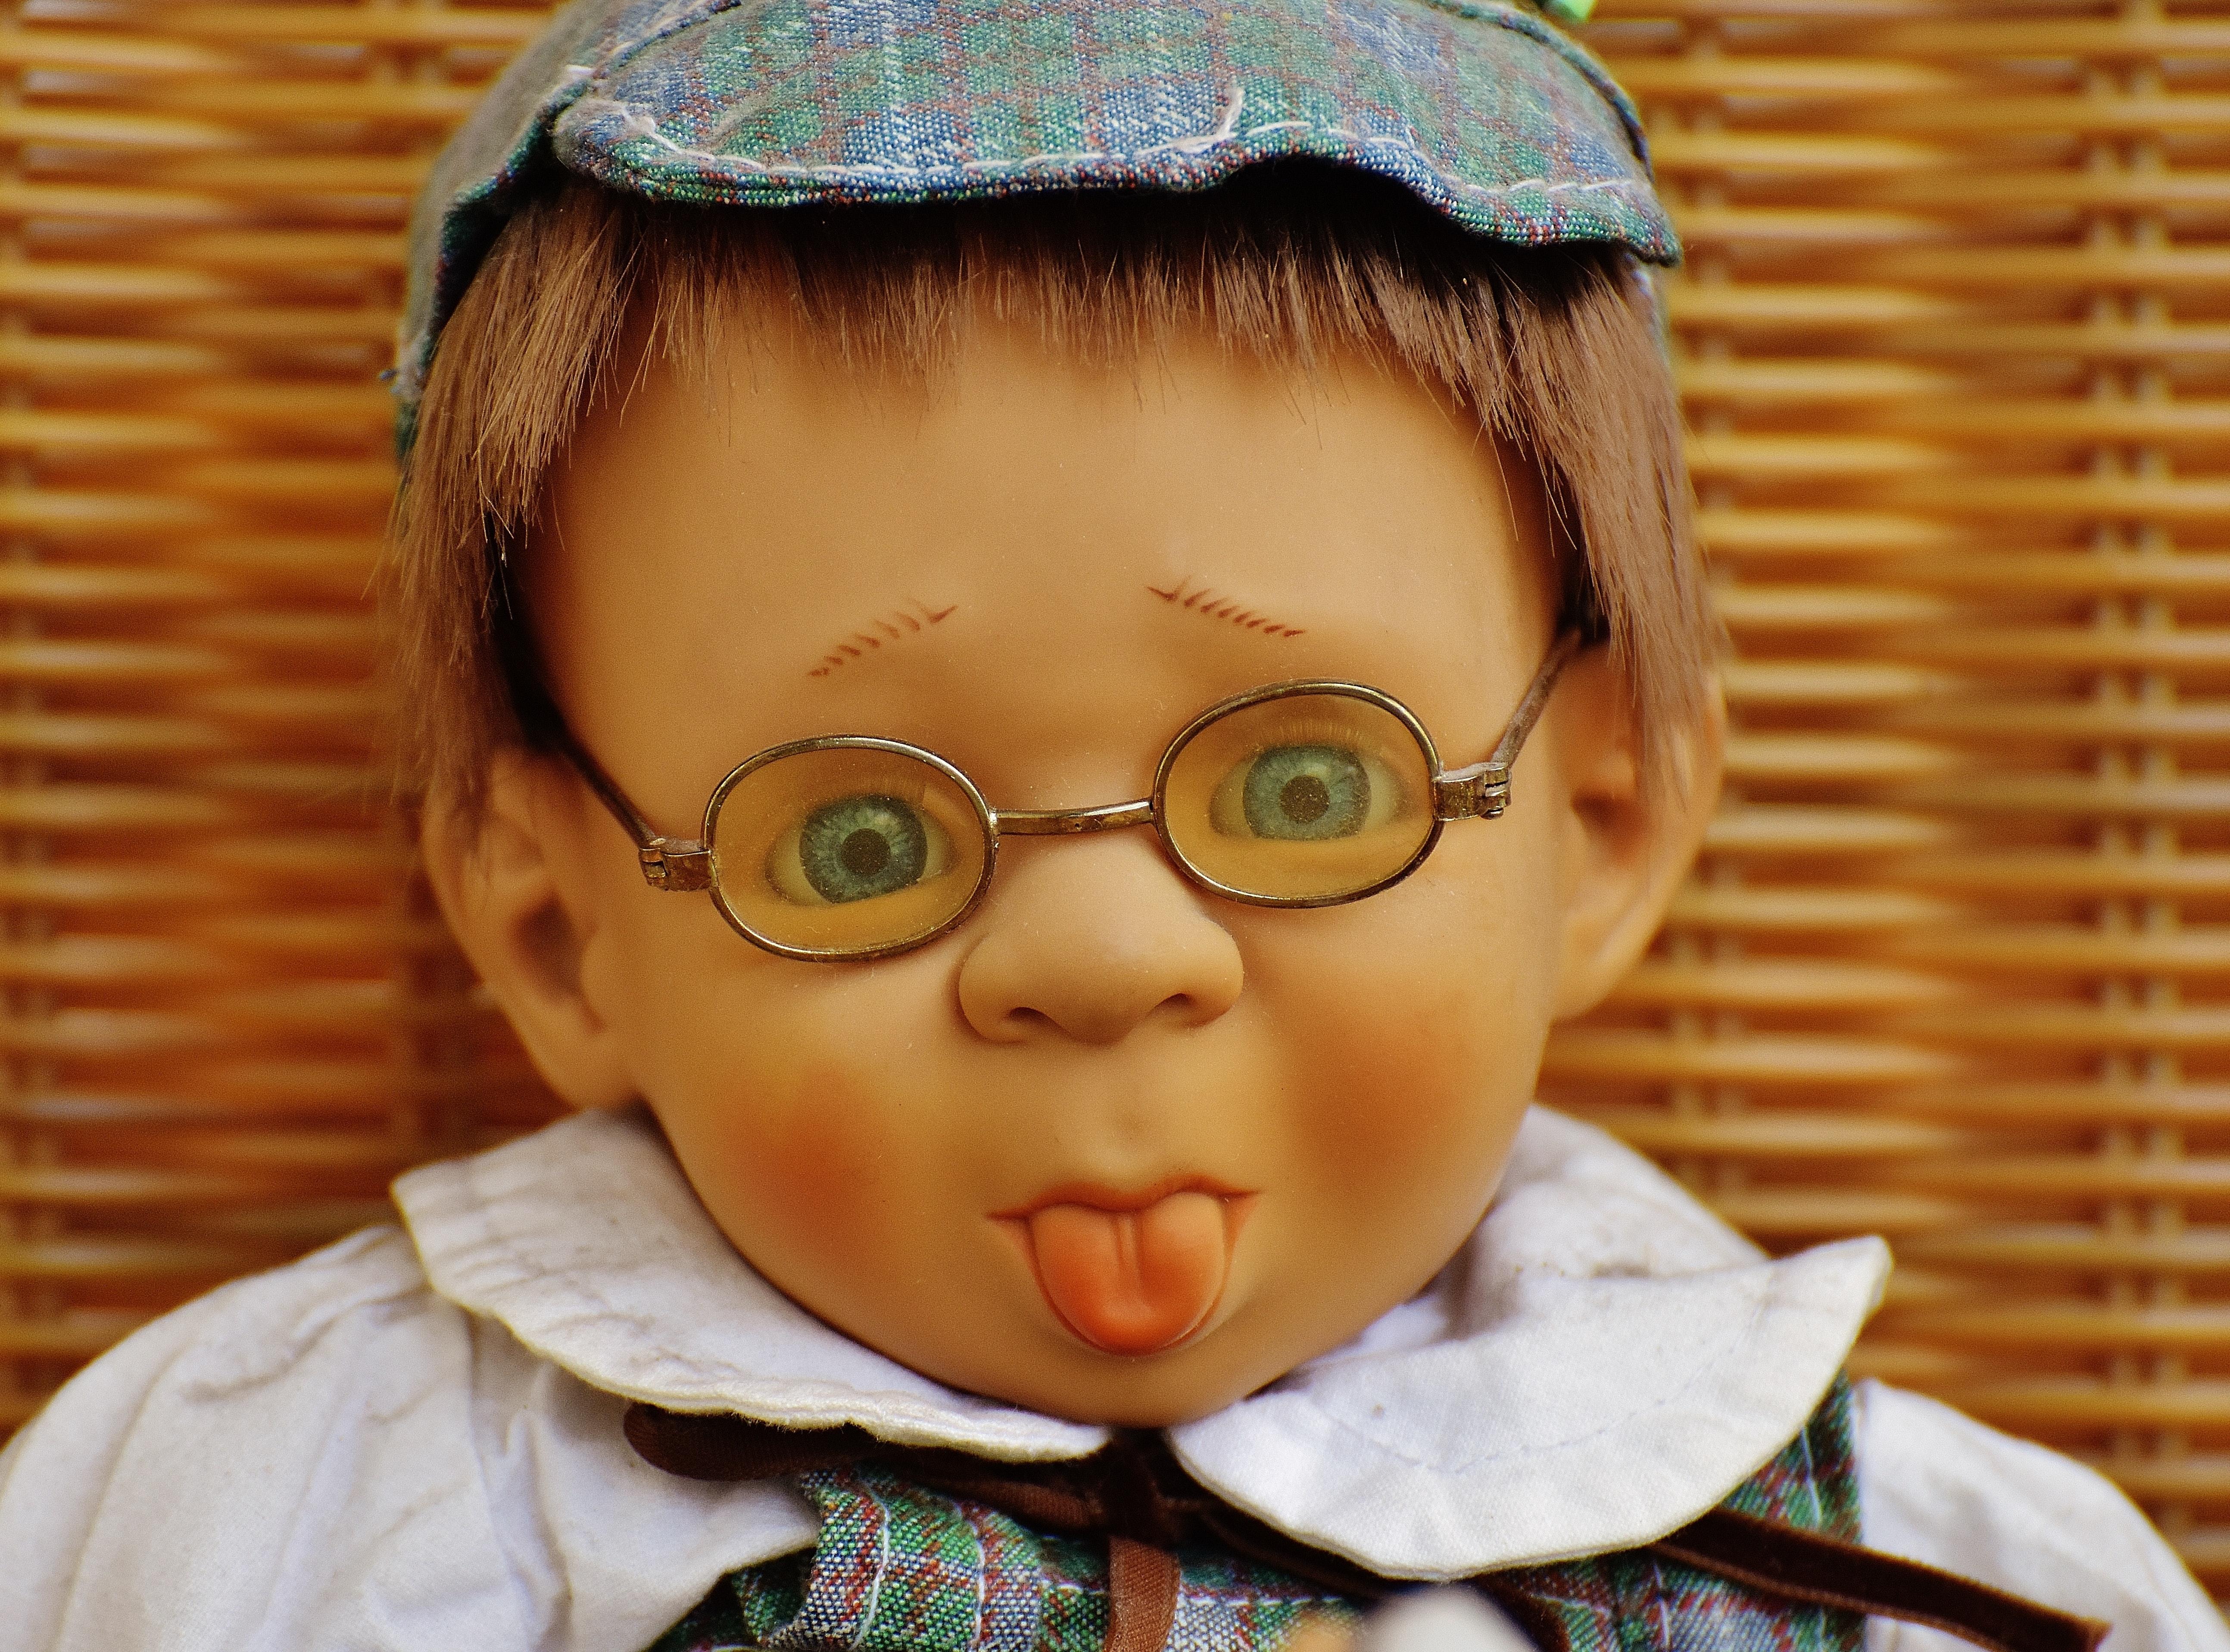 Doll wearing eyeglasses photo